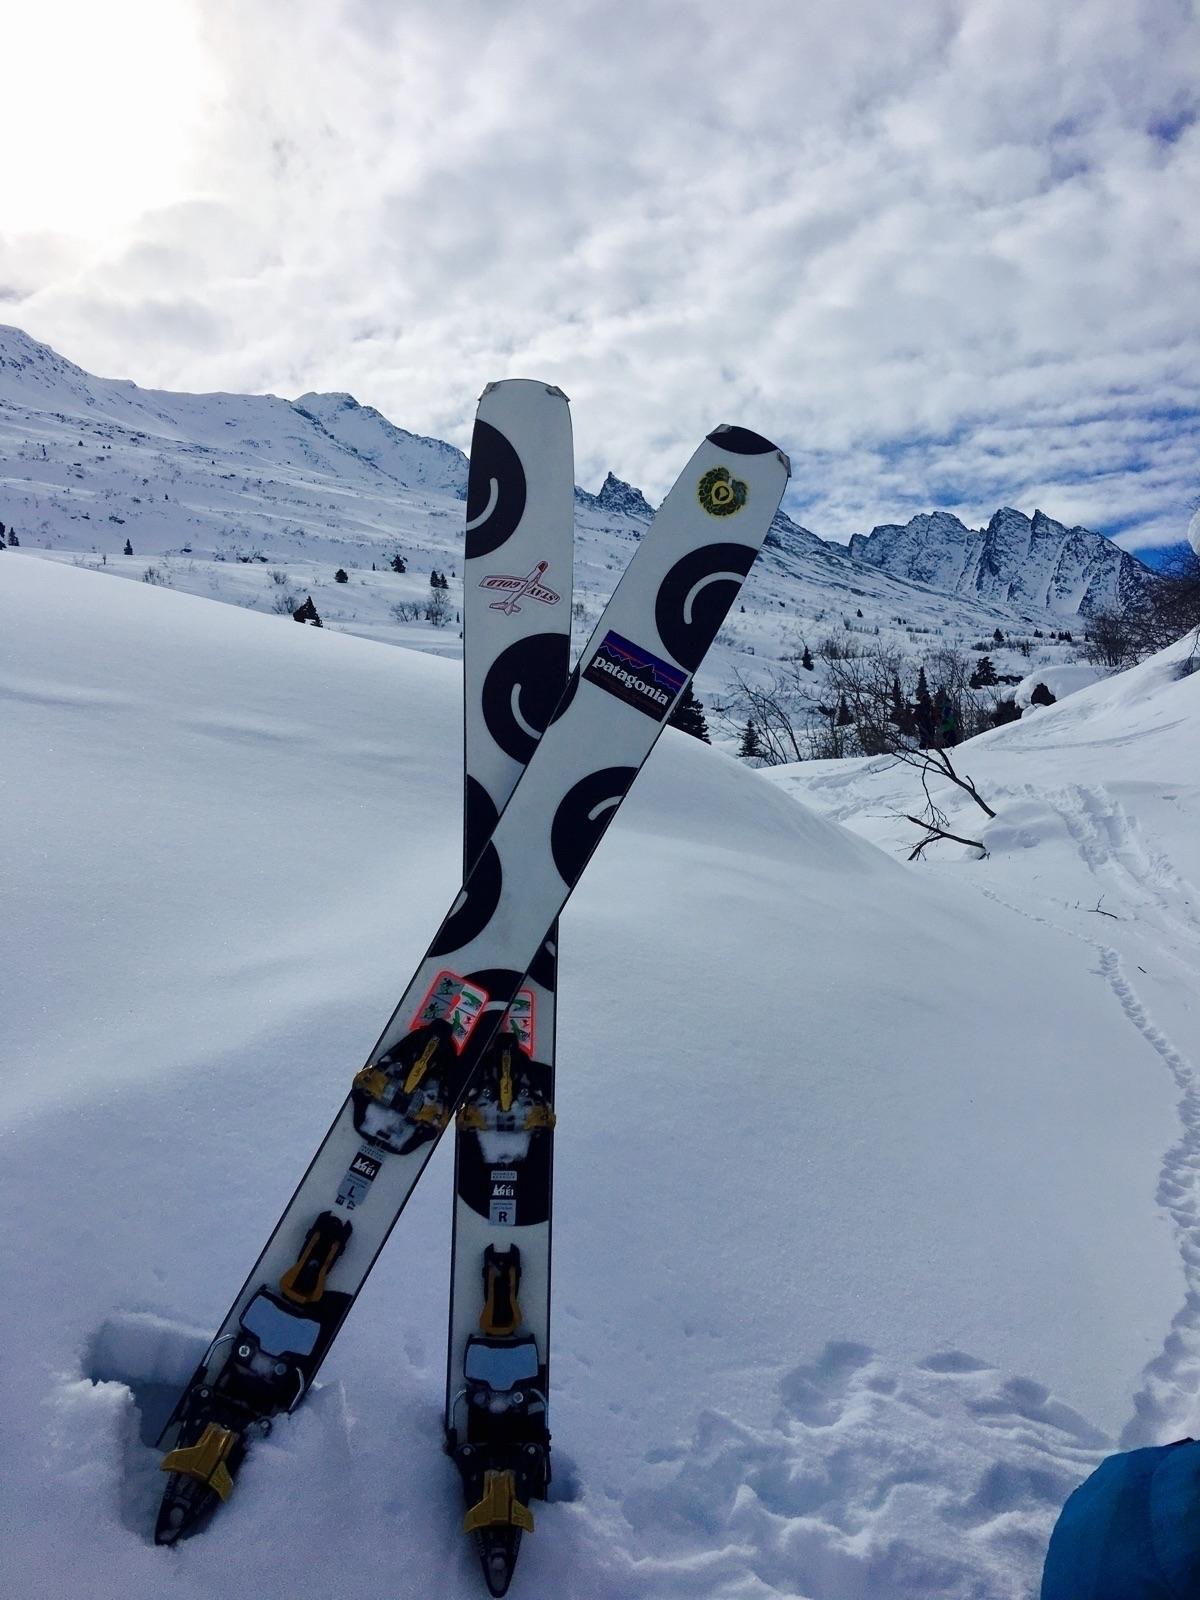 Long due live Alaska, skis soli - tobyharriman | ello